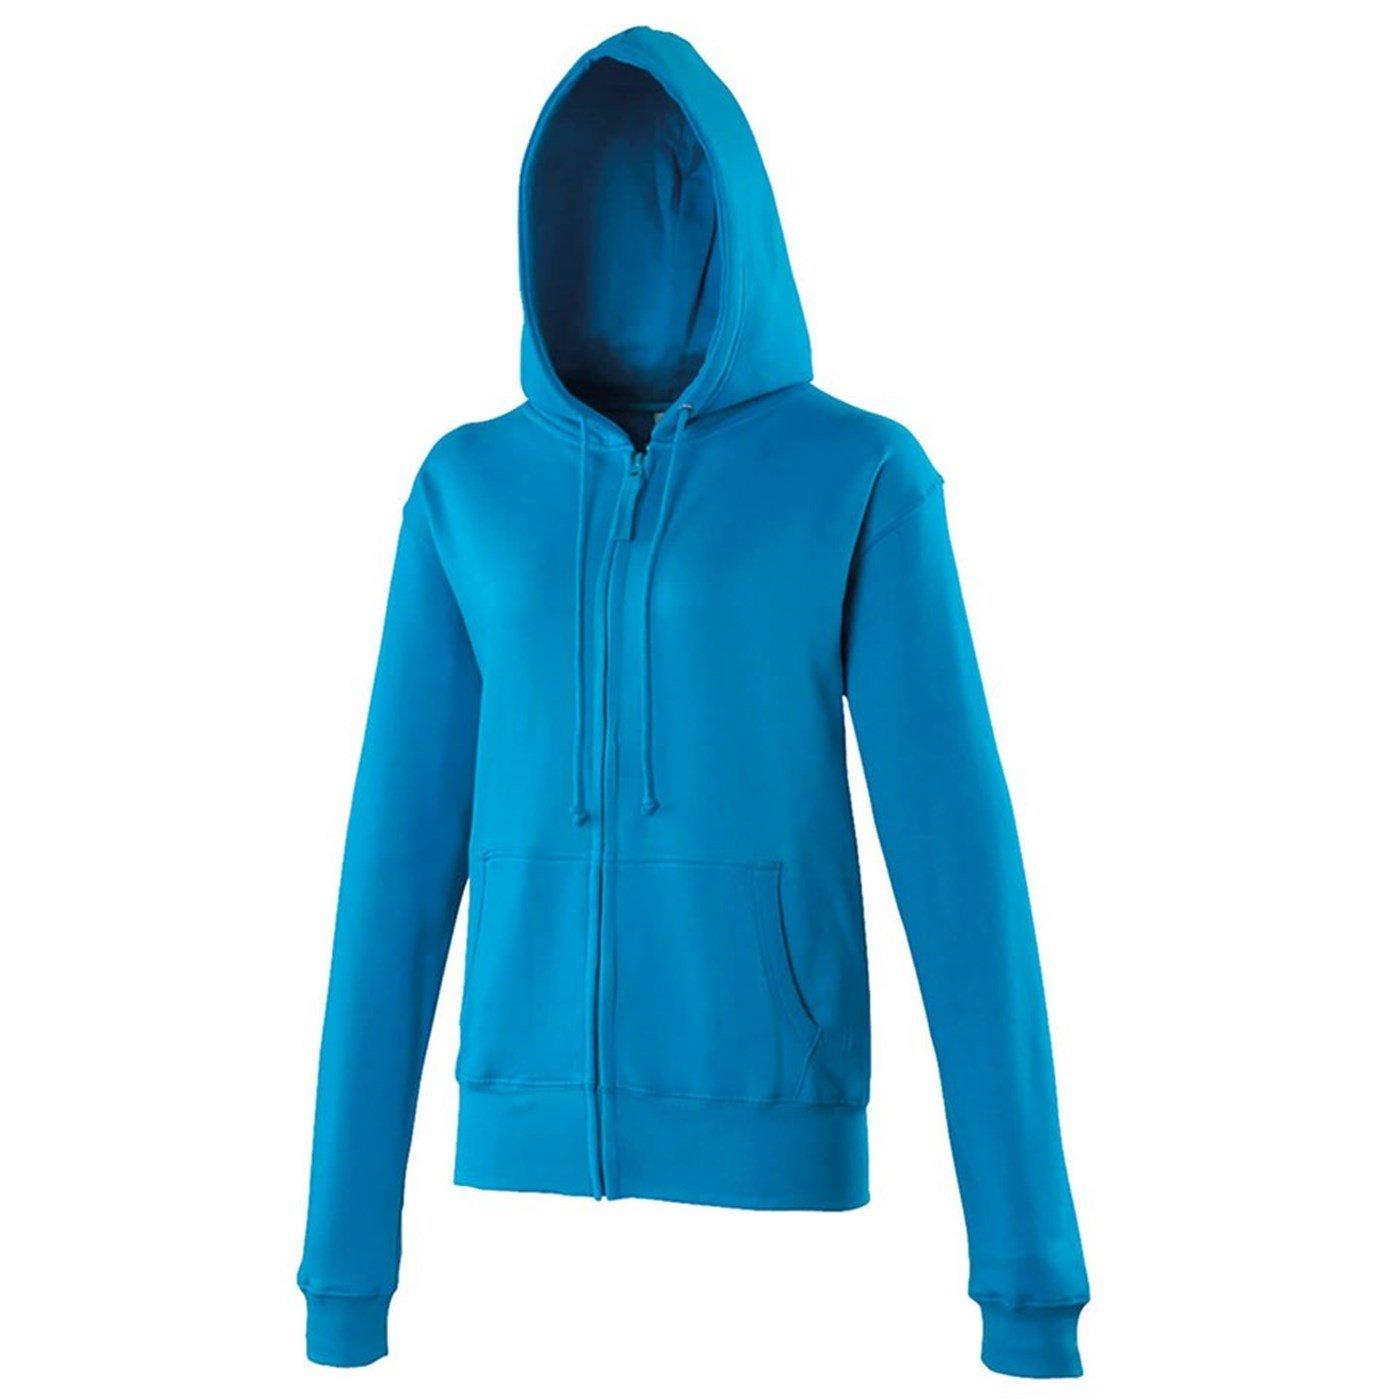 2db75b2e AWDis Just Hoods Girlie Zoodie Hooded Sweatshirt JH055